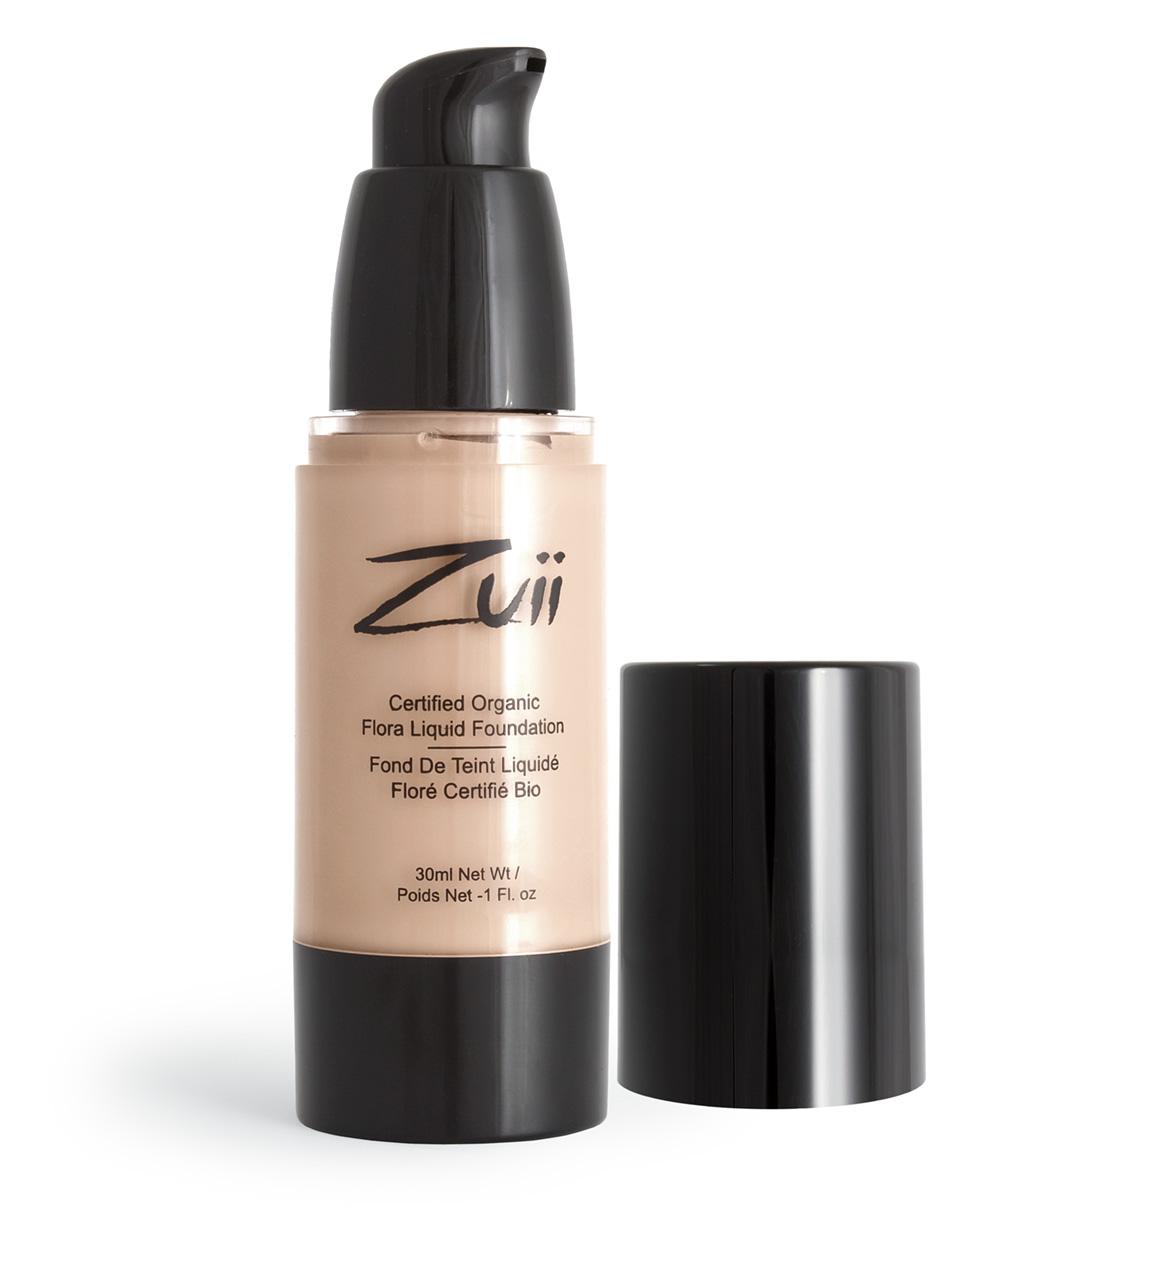 Zuii Certified Organic Flora Liquid Foundation Beige Medium